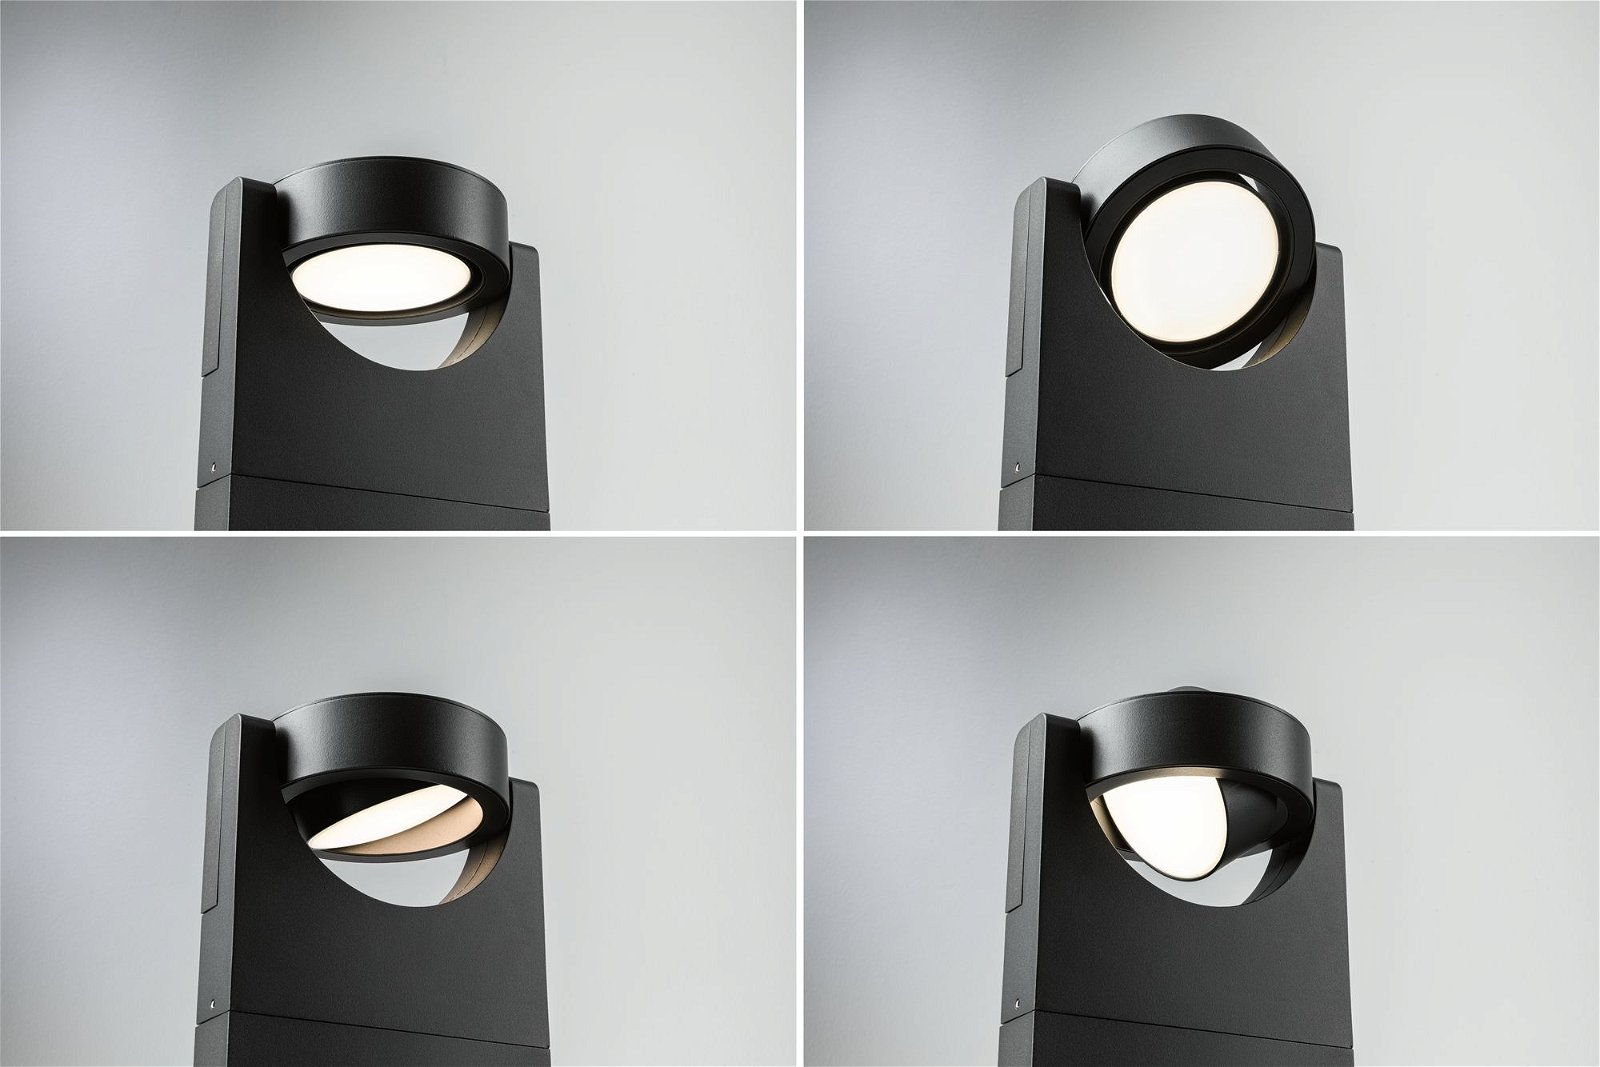 LED Pollerleuchte Swivea IP44 625mm 3000K 8W 1150lm 230V Anthrazit Aluminium